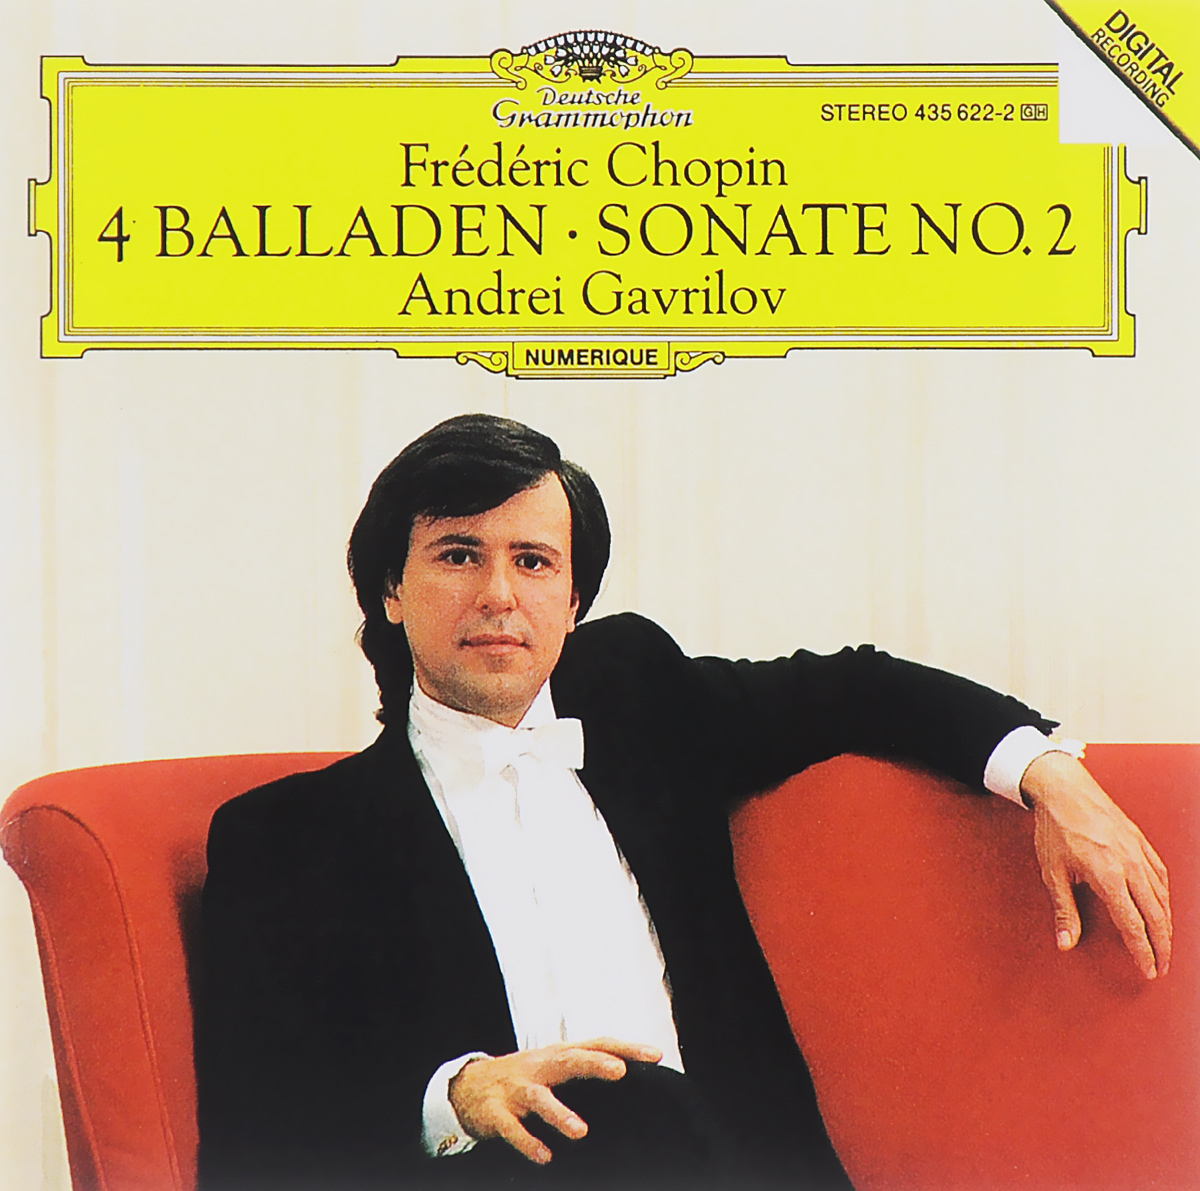 все цены на Андрей Гаврилов Andrei Gavrilov. Frederic Chopin. 4 Balladen / Sonate No. 2 онлайн